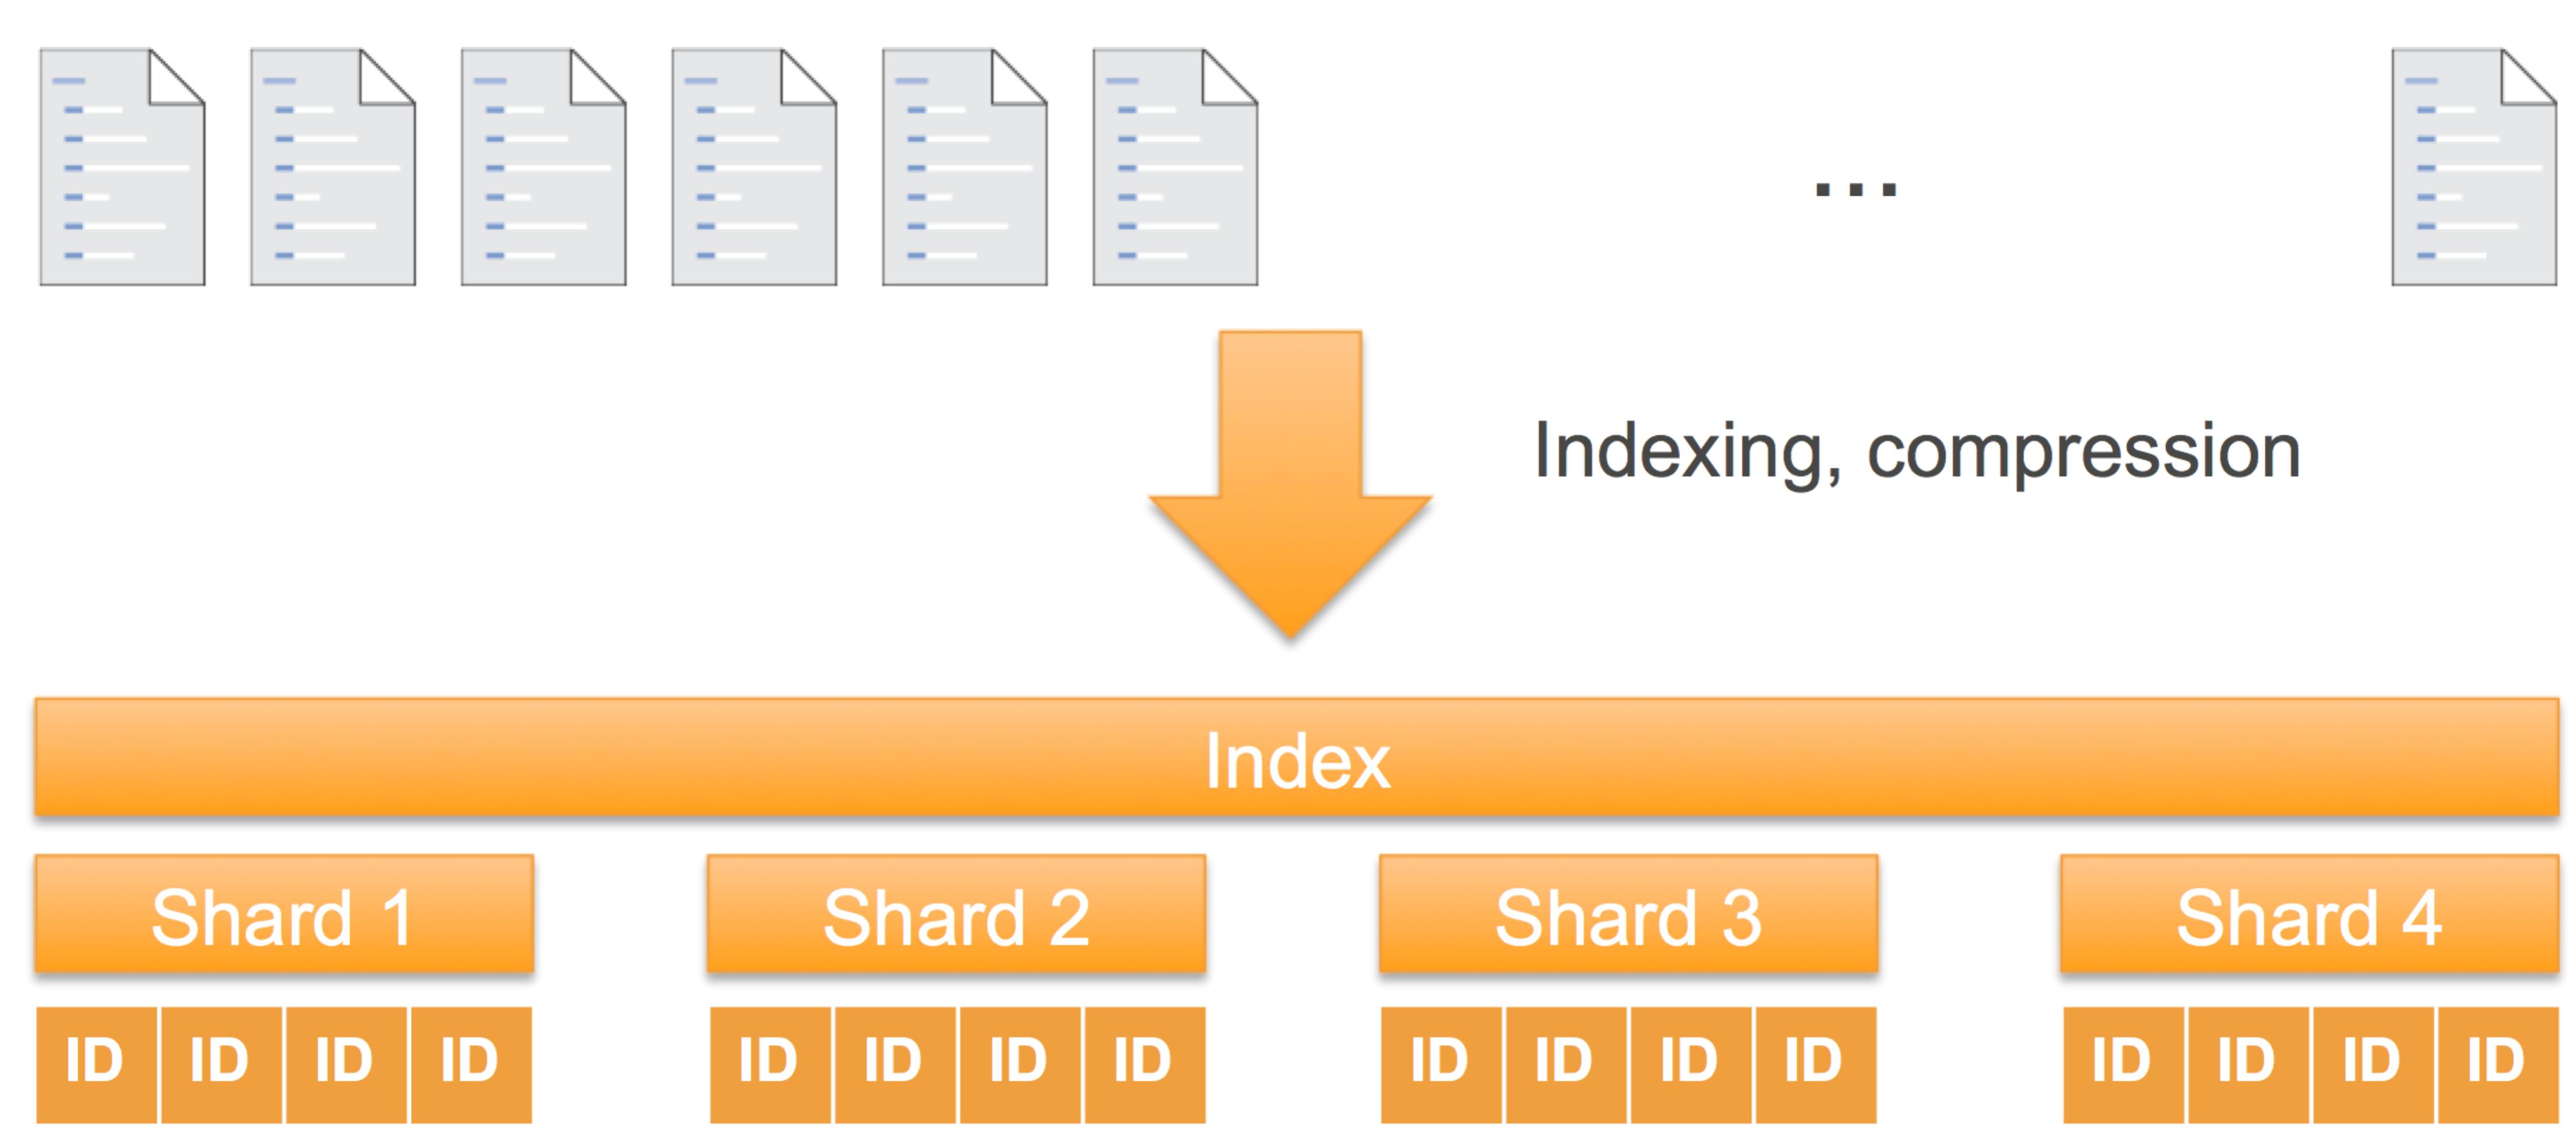 IndexSpace